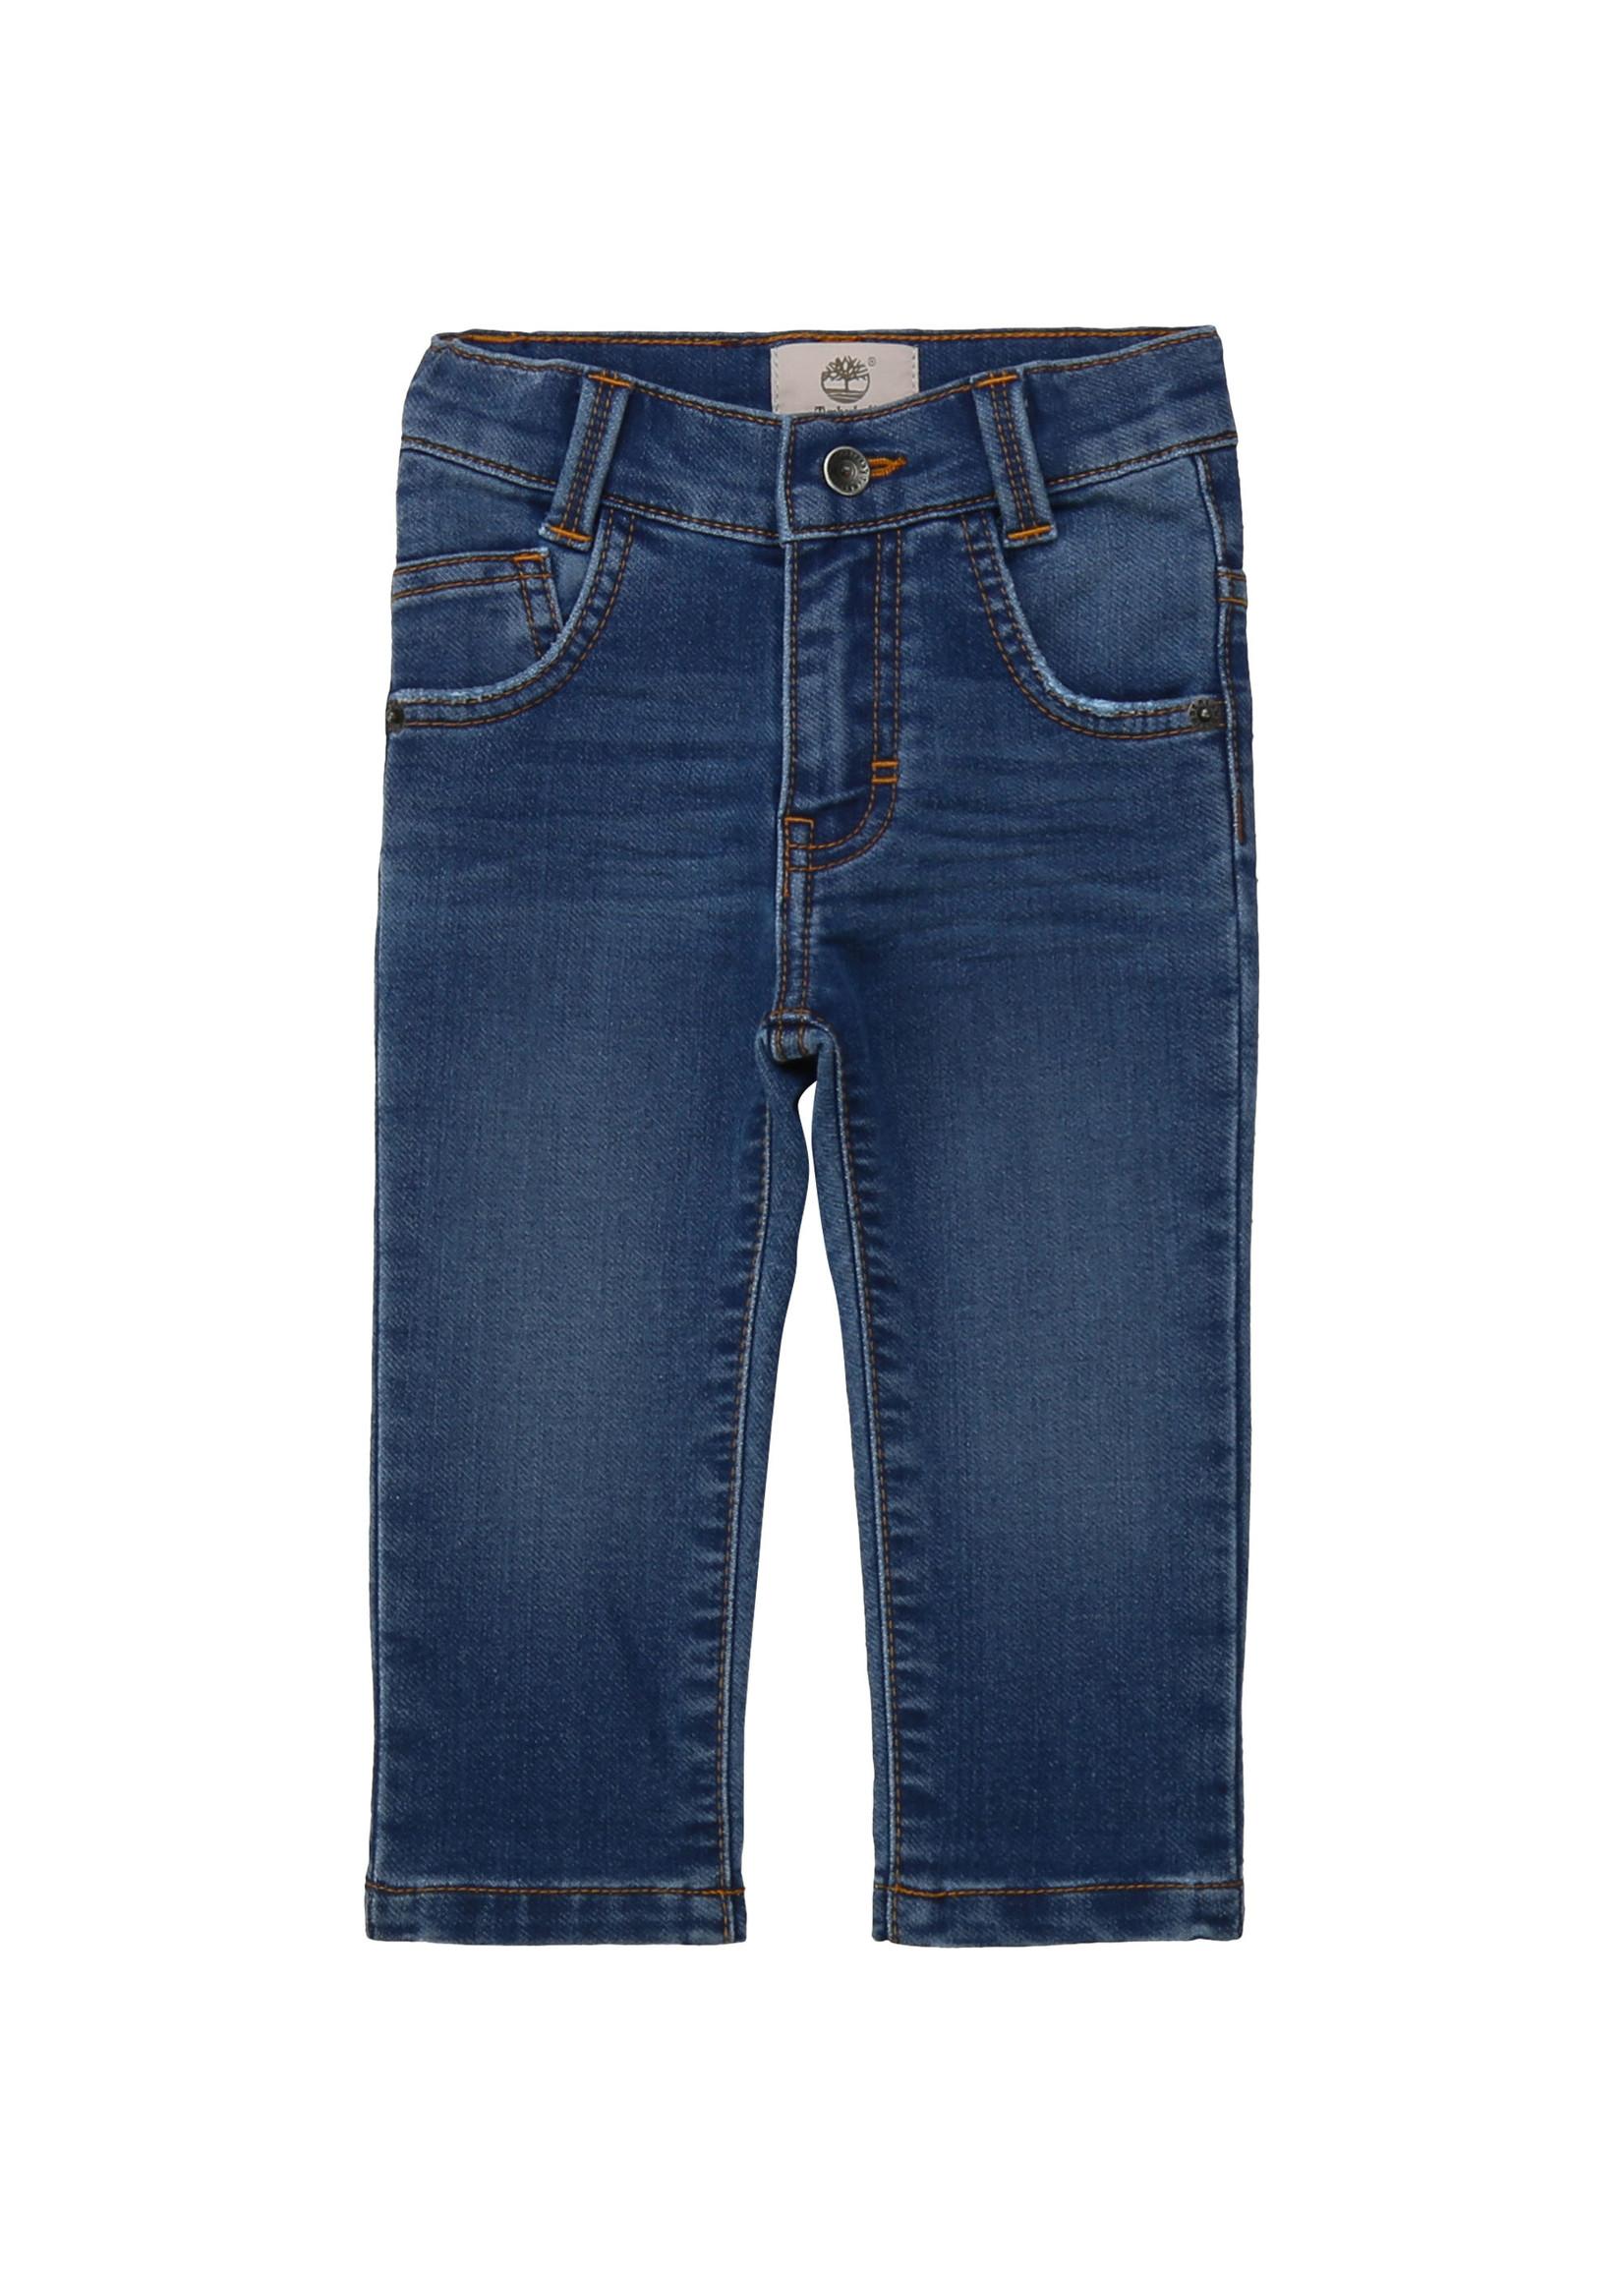 Timberland TIMBERLAND BABY Jeans denim brut